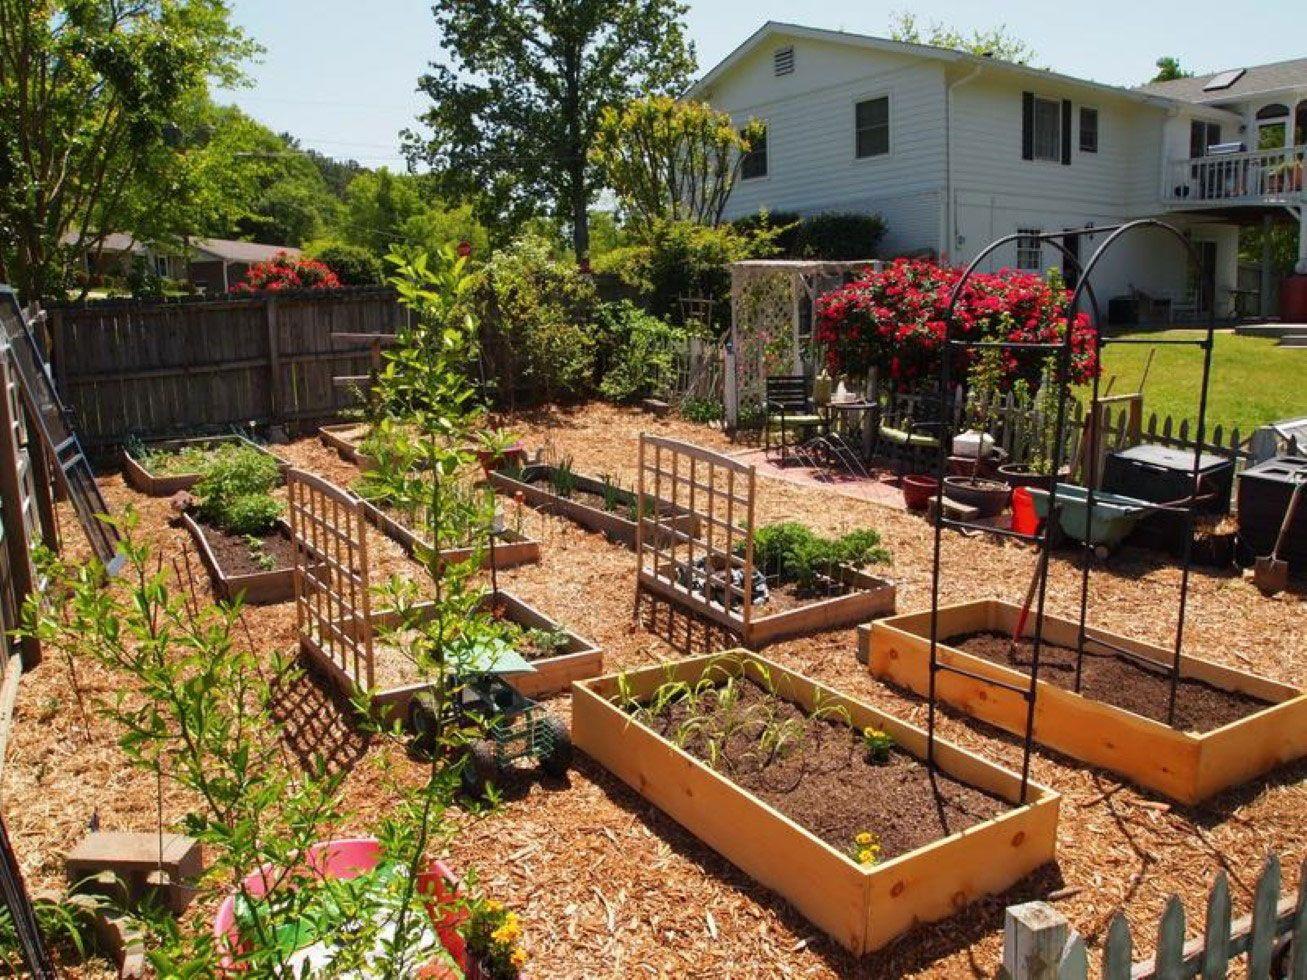 front-lawn-vegetable-garden-18.jpg (1307×980) | Garden | Pinterest ...